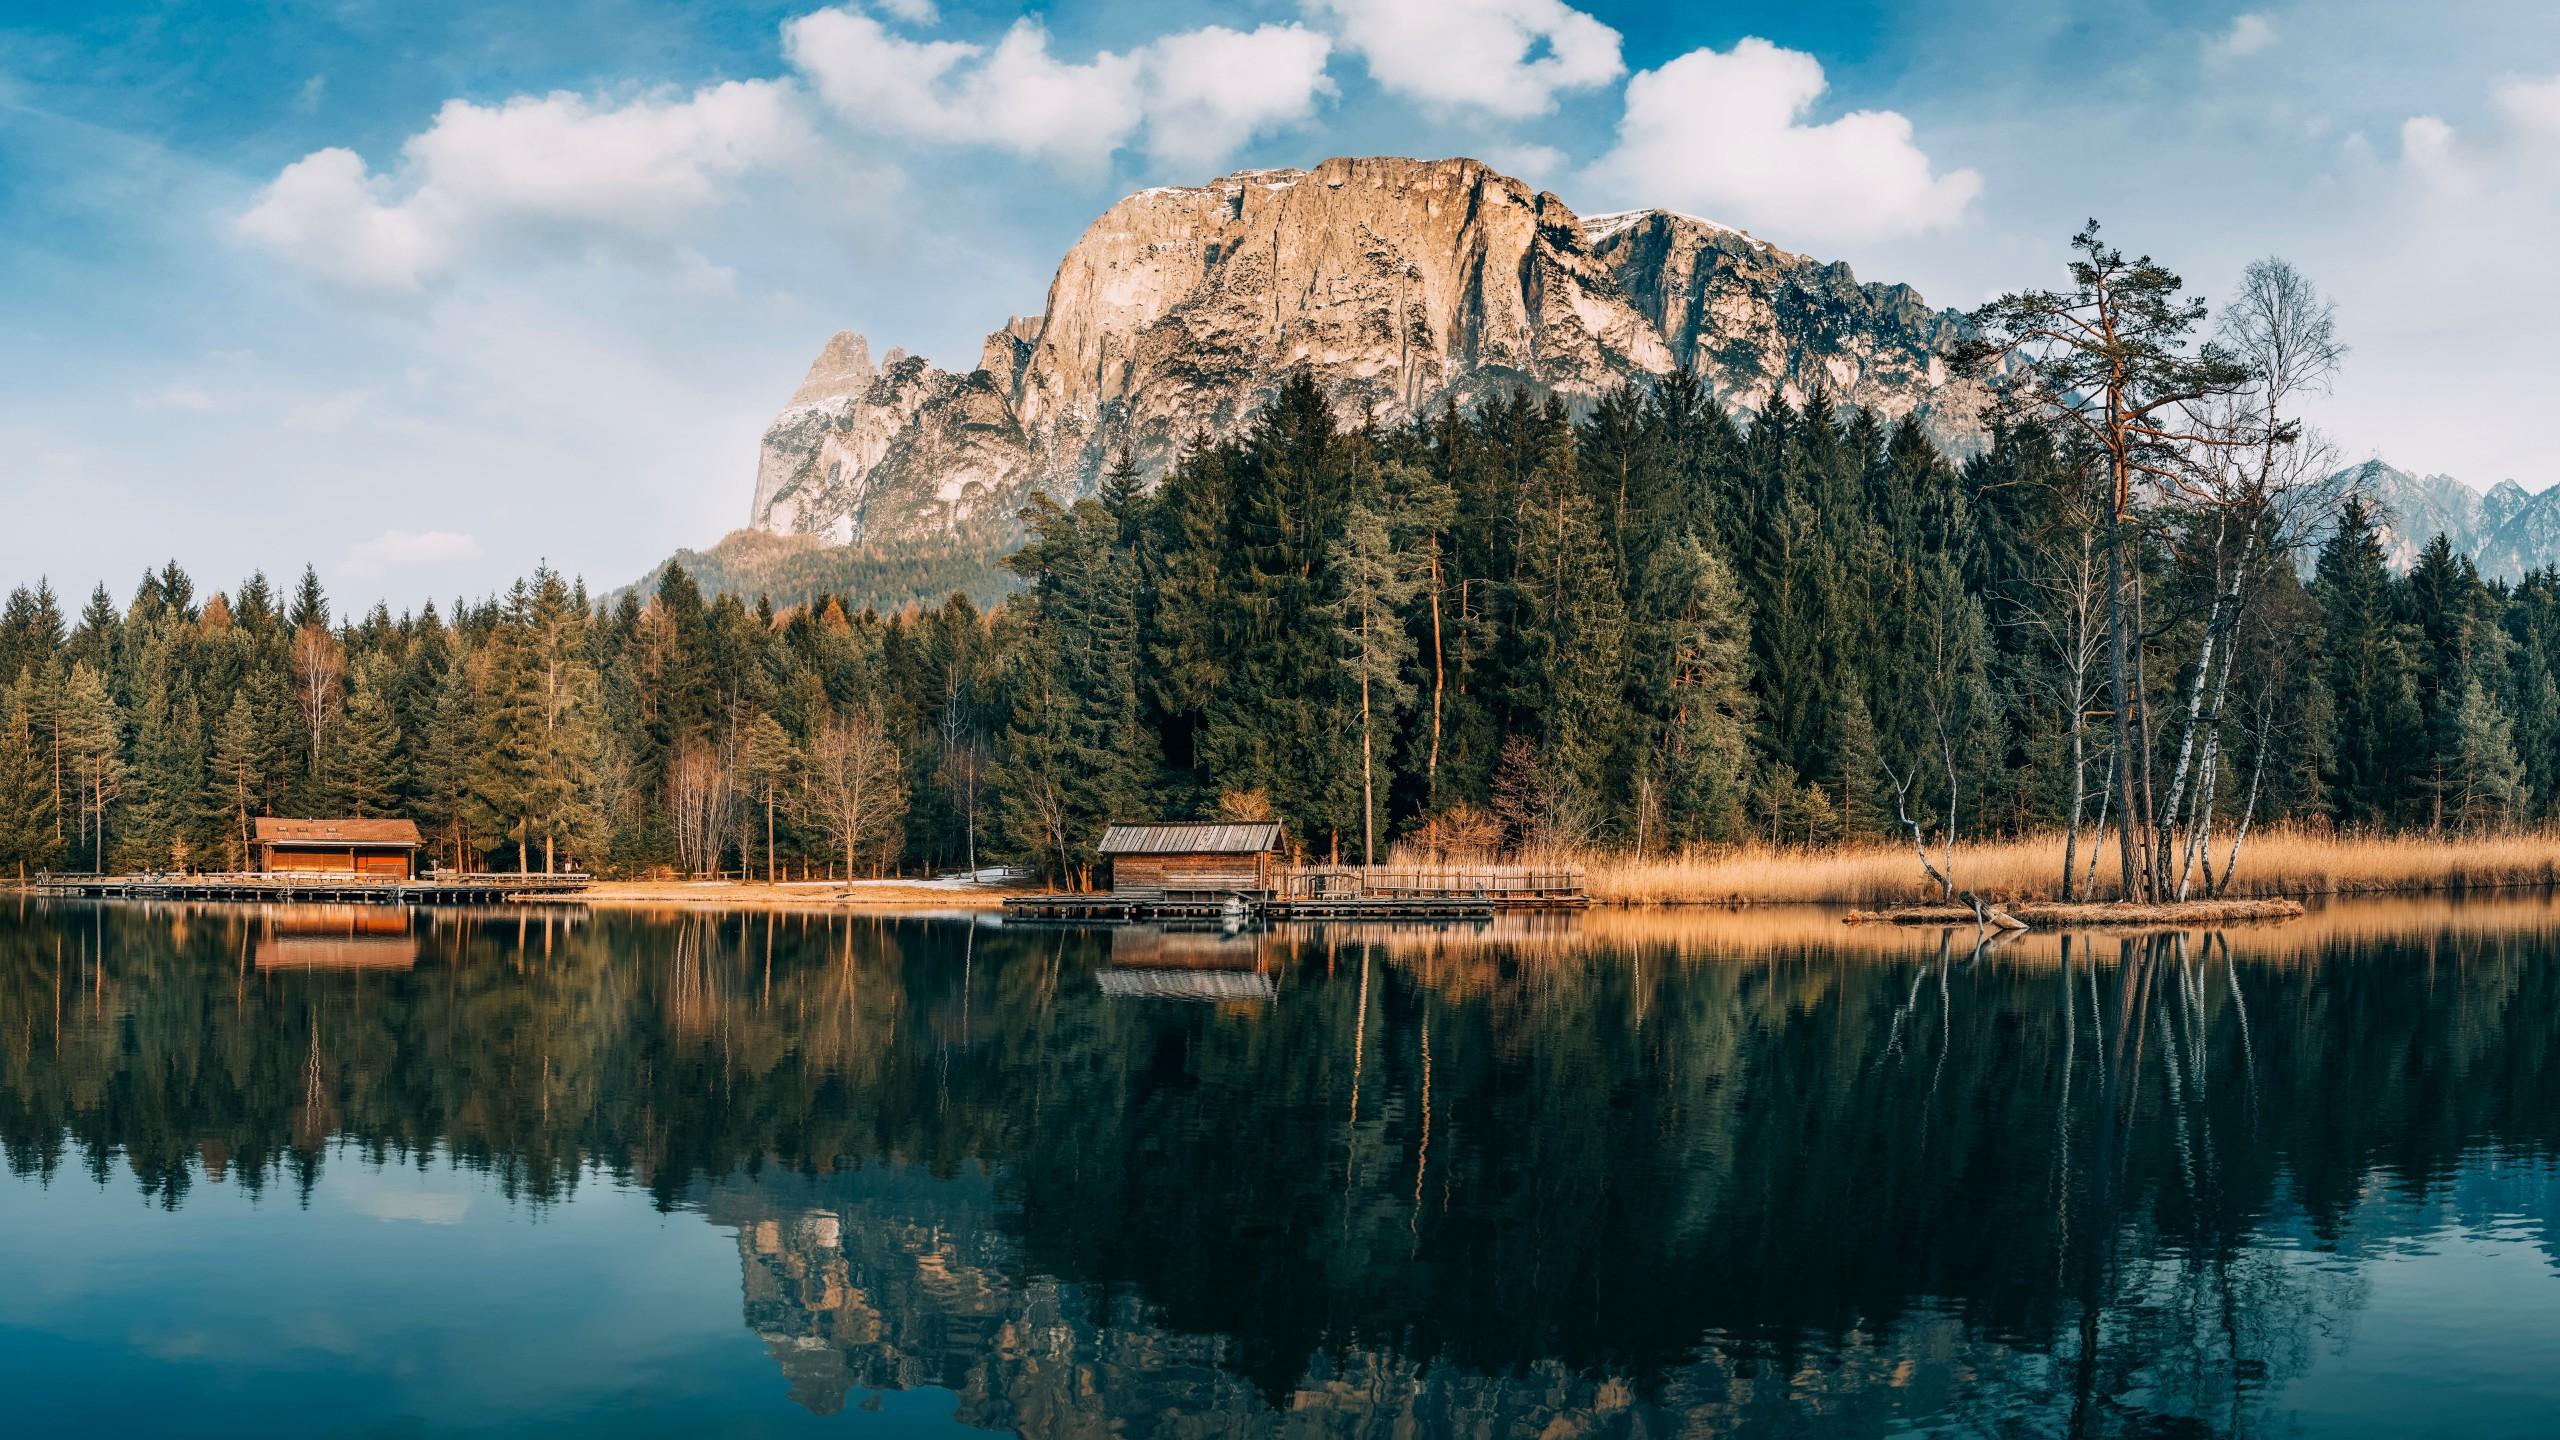 Wallpaper Mountains, 5k, 4k Wallpaper, 8k, Lake, Forest